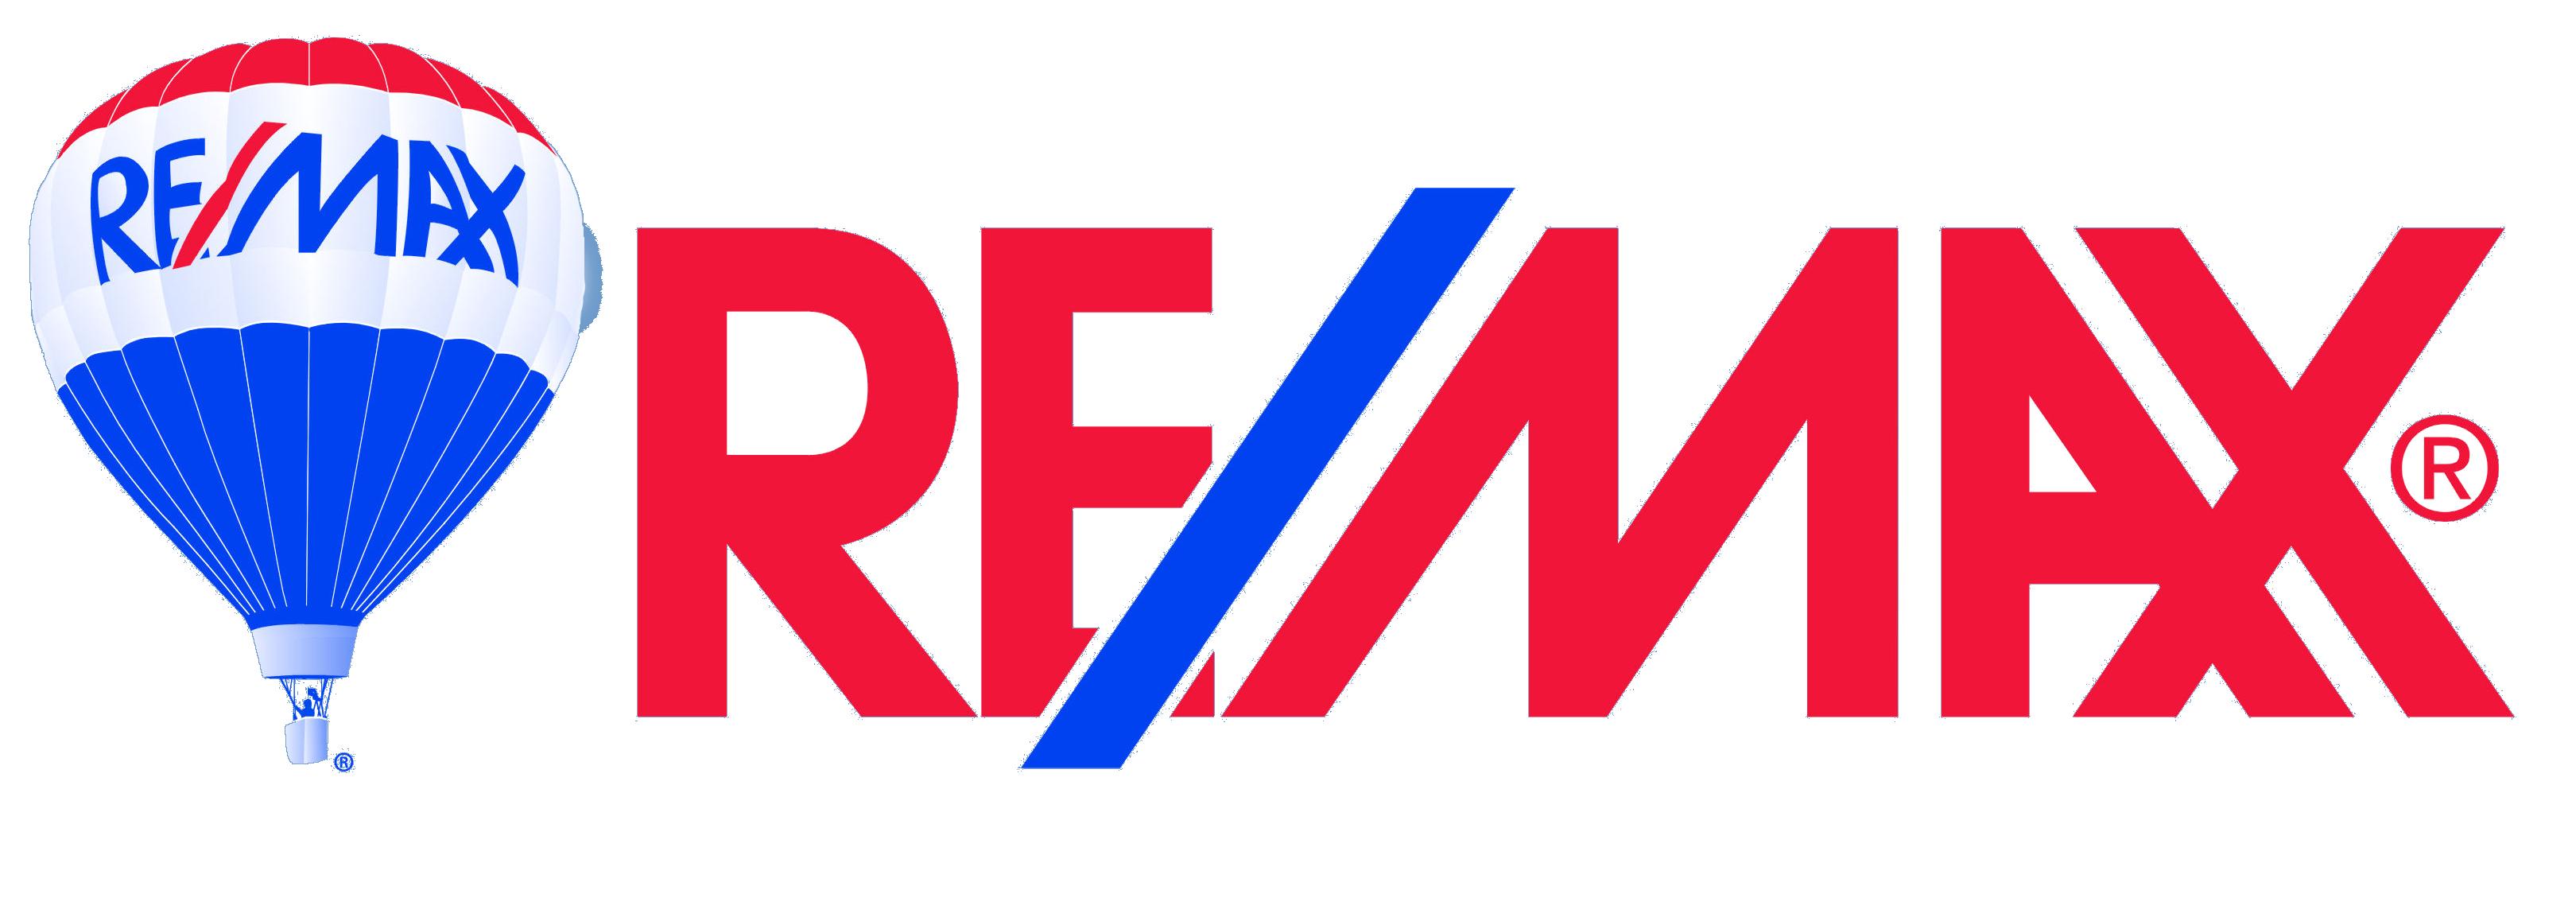 Remax 2001 Inc.